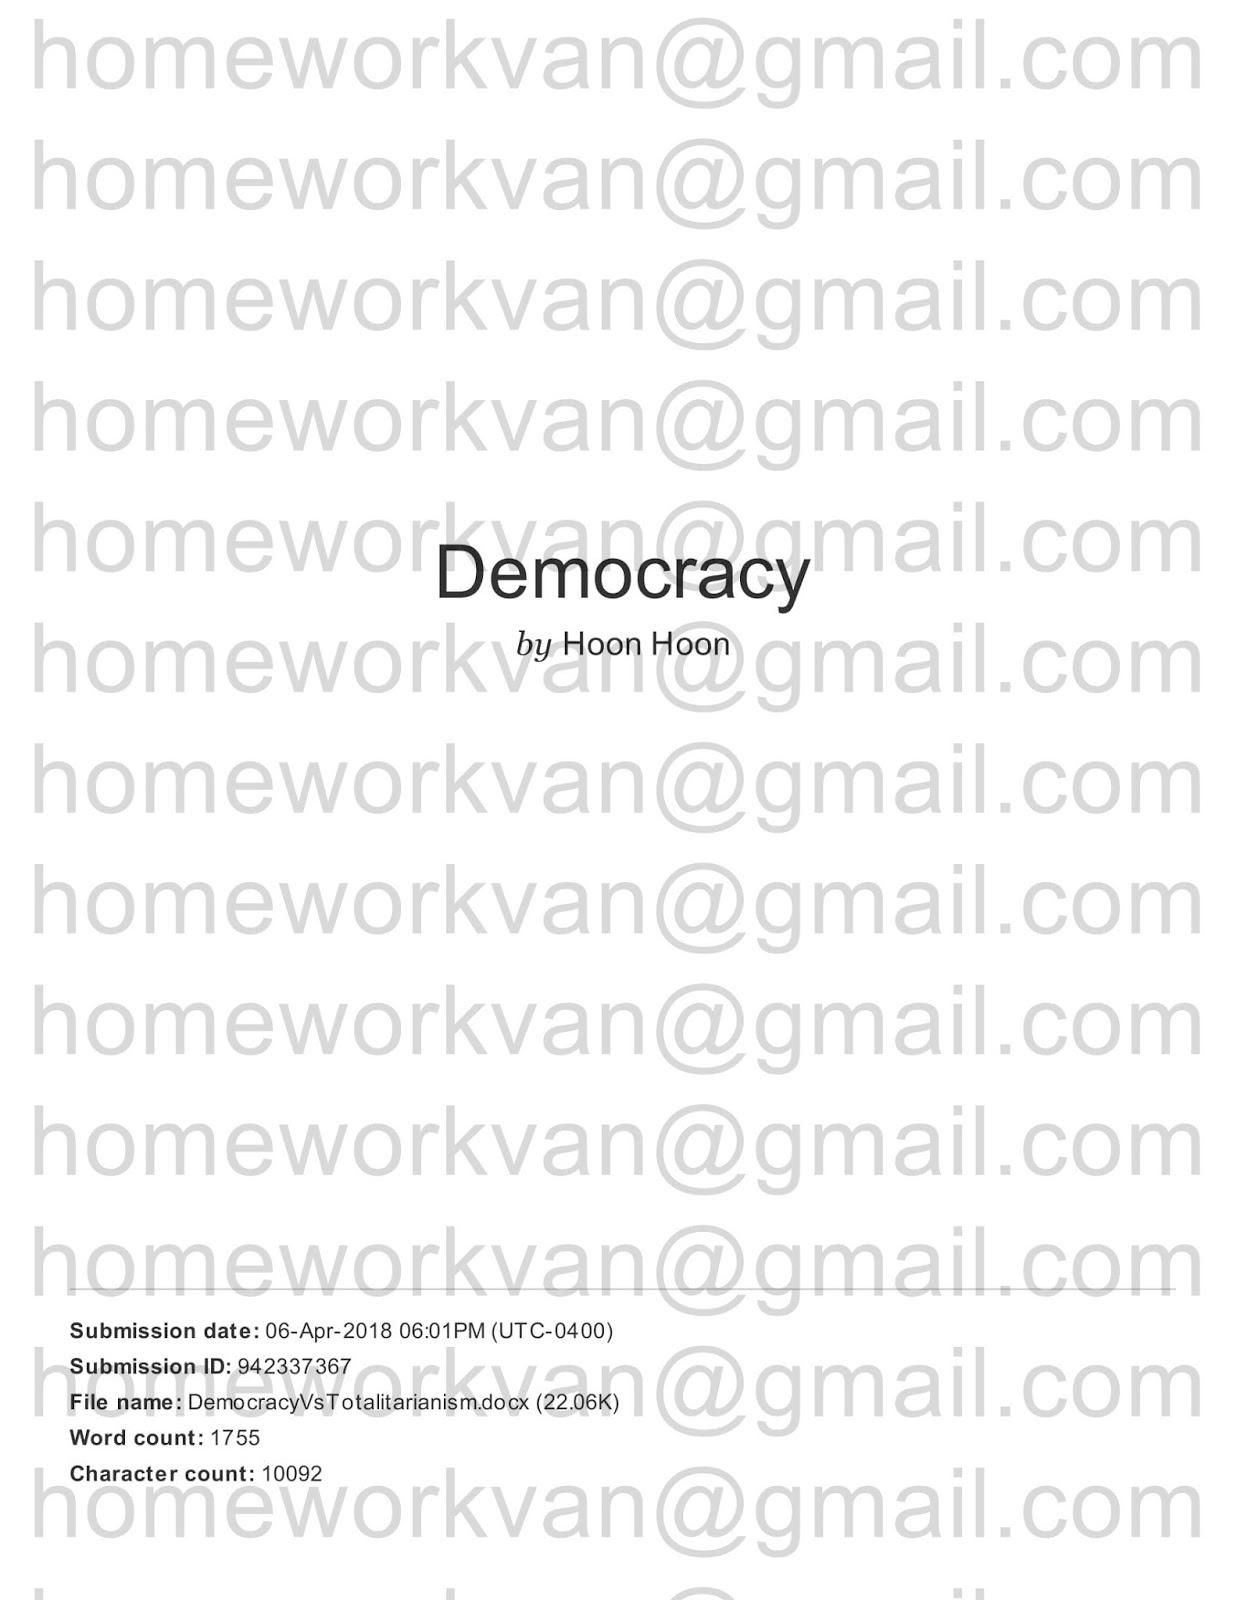 homeworkvan official blog: A Comparison of Democratic and